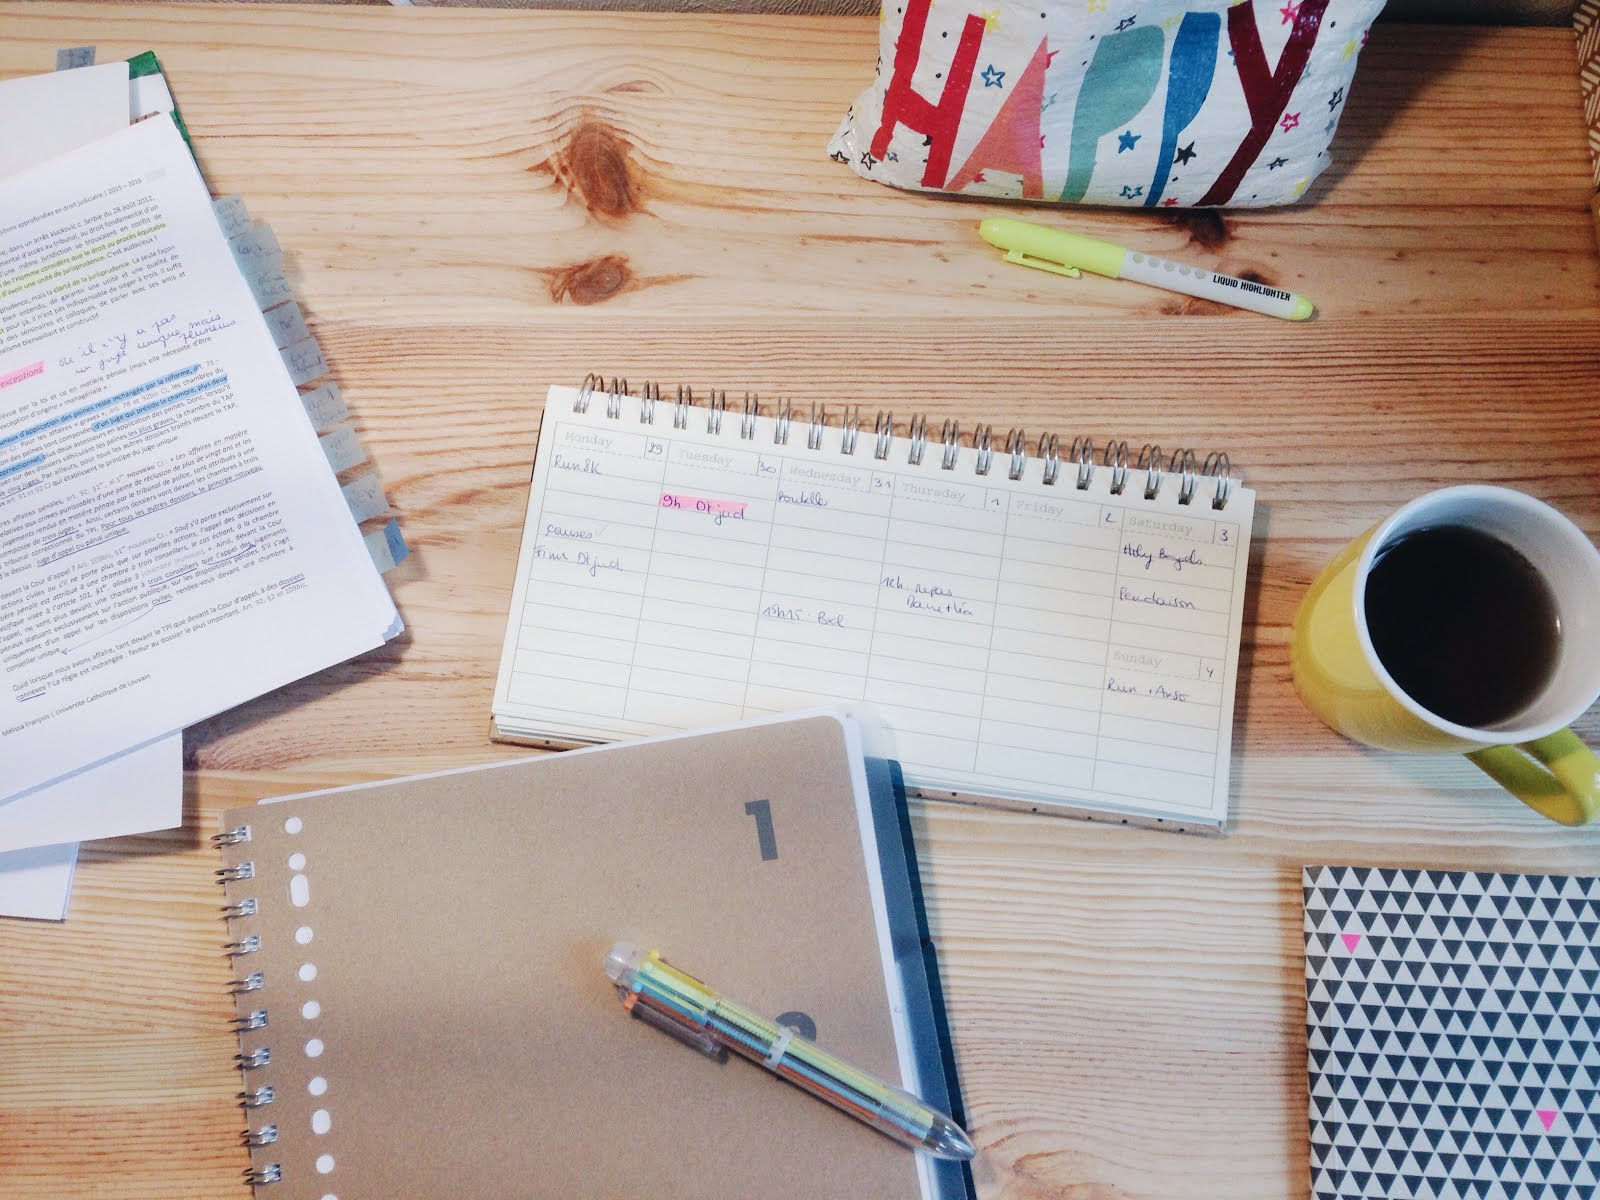 office study motivation ravacholle lifestyle blog pens on a desk life lately blog post